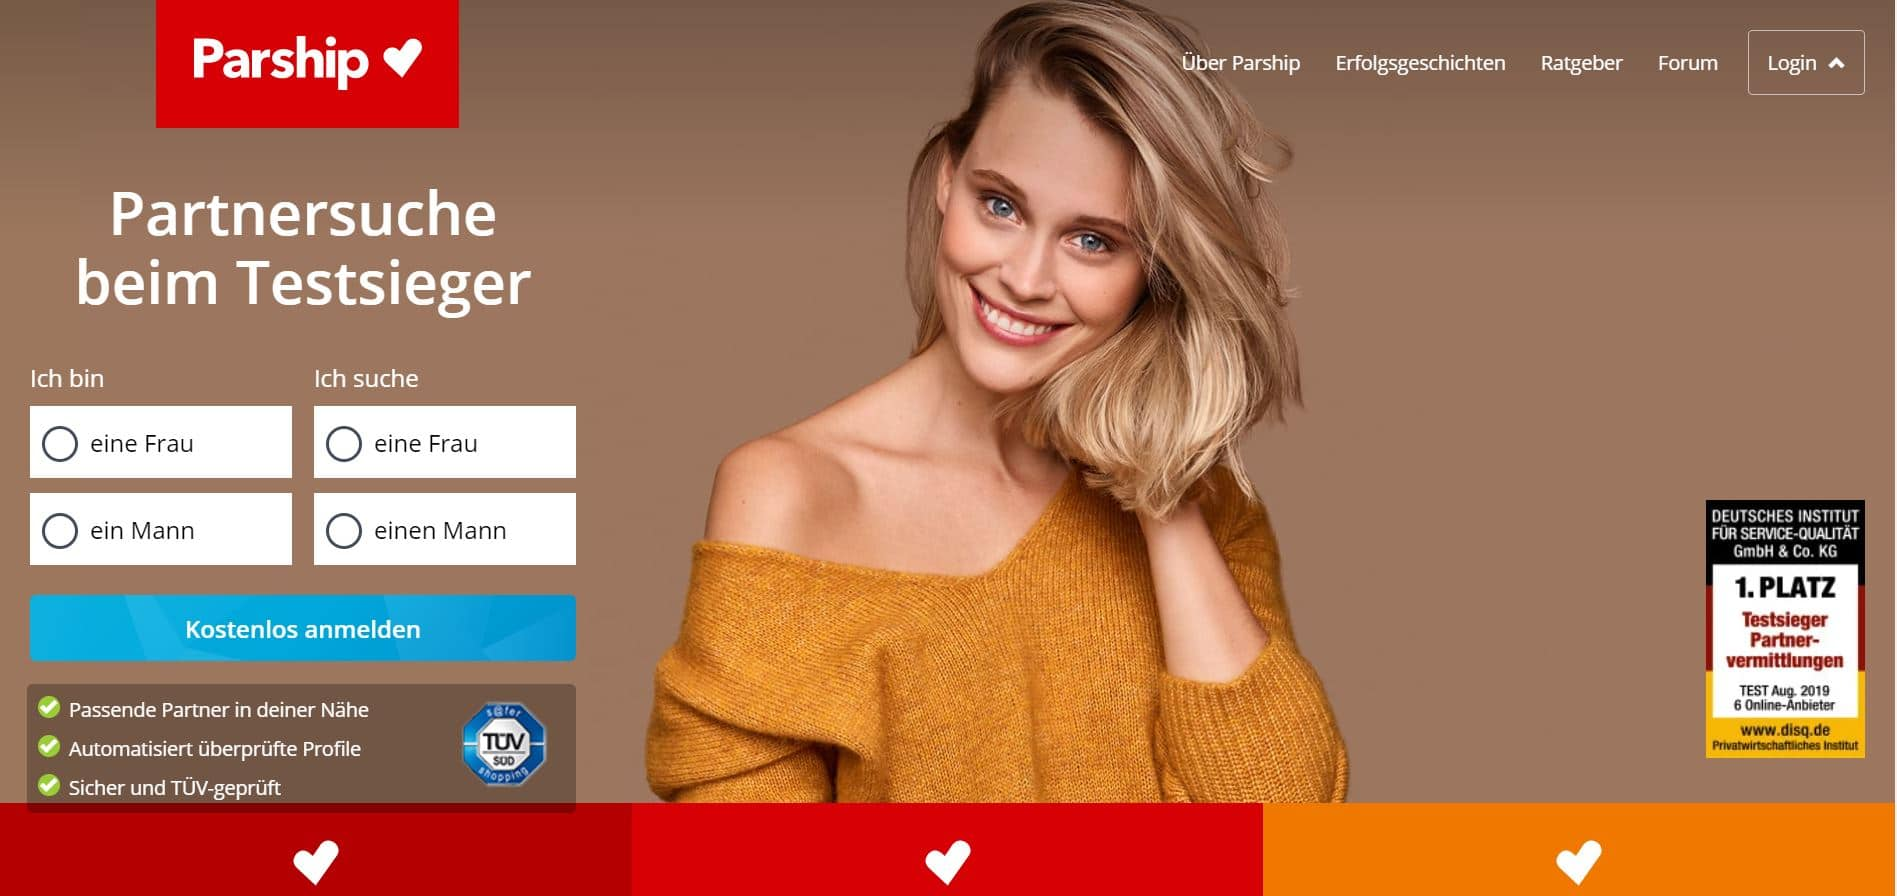 Kostenlos dating portal